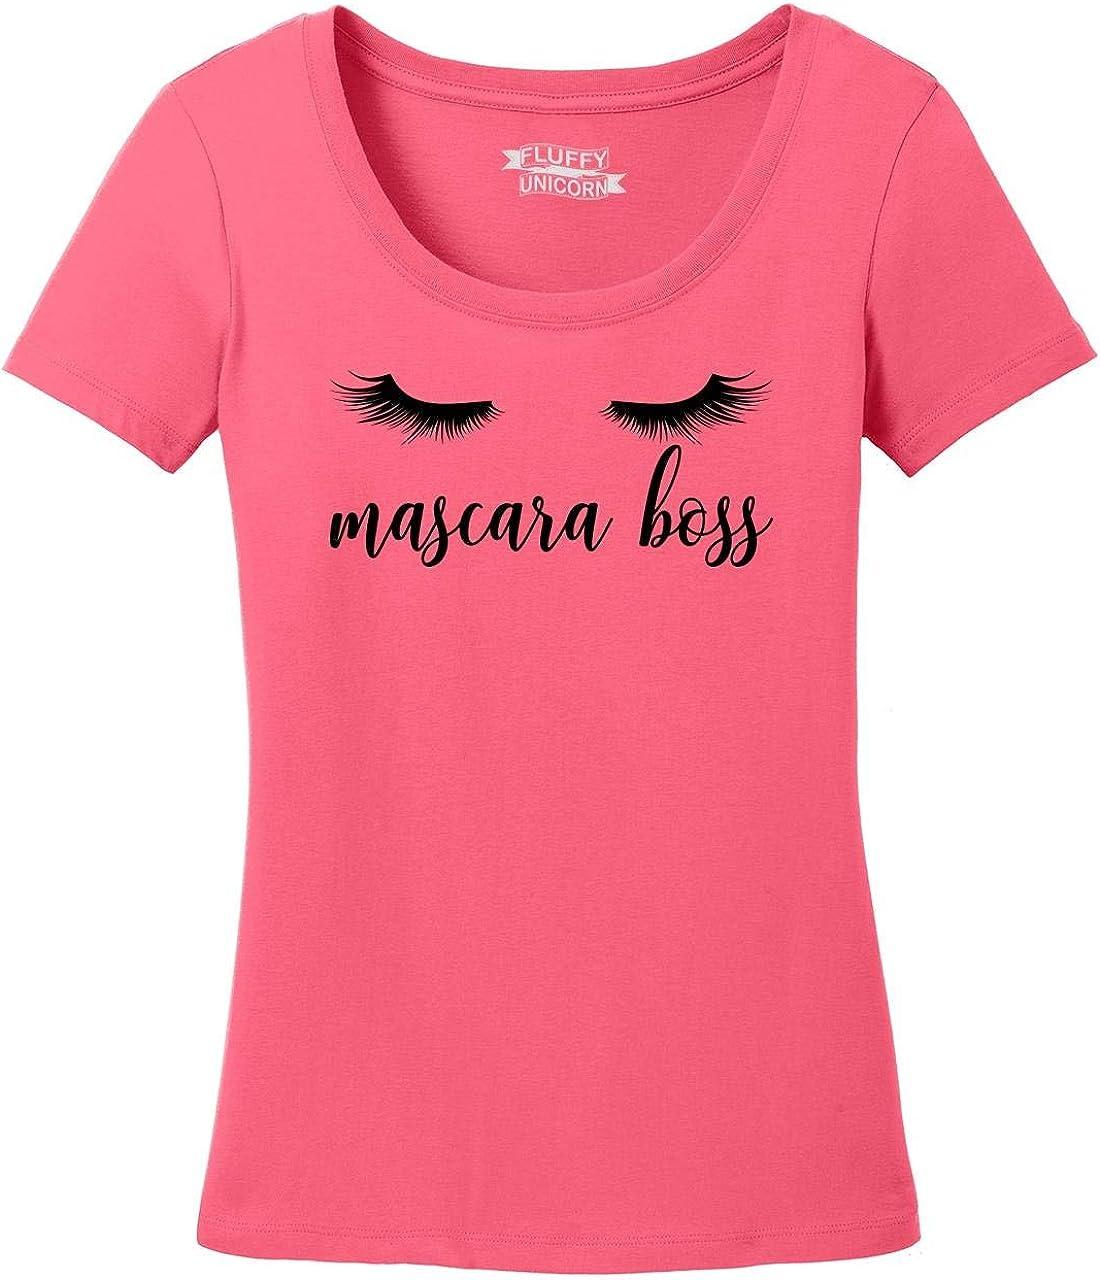 Comical Shirt Ladies Mascara Boss Scoop Tee